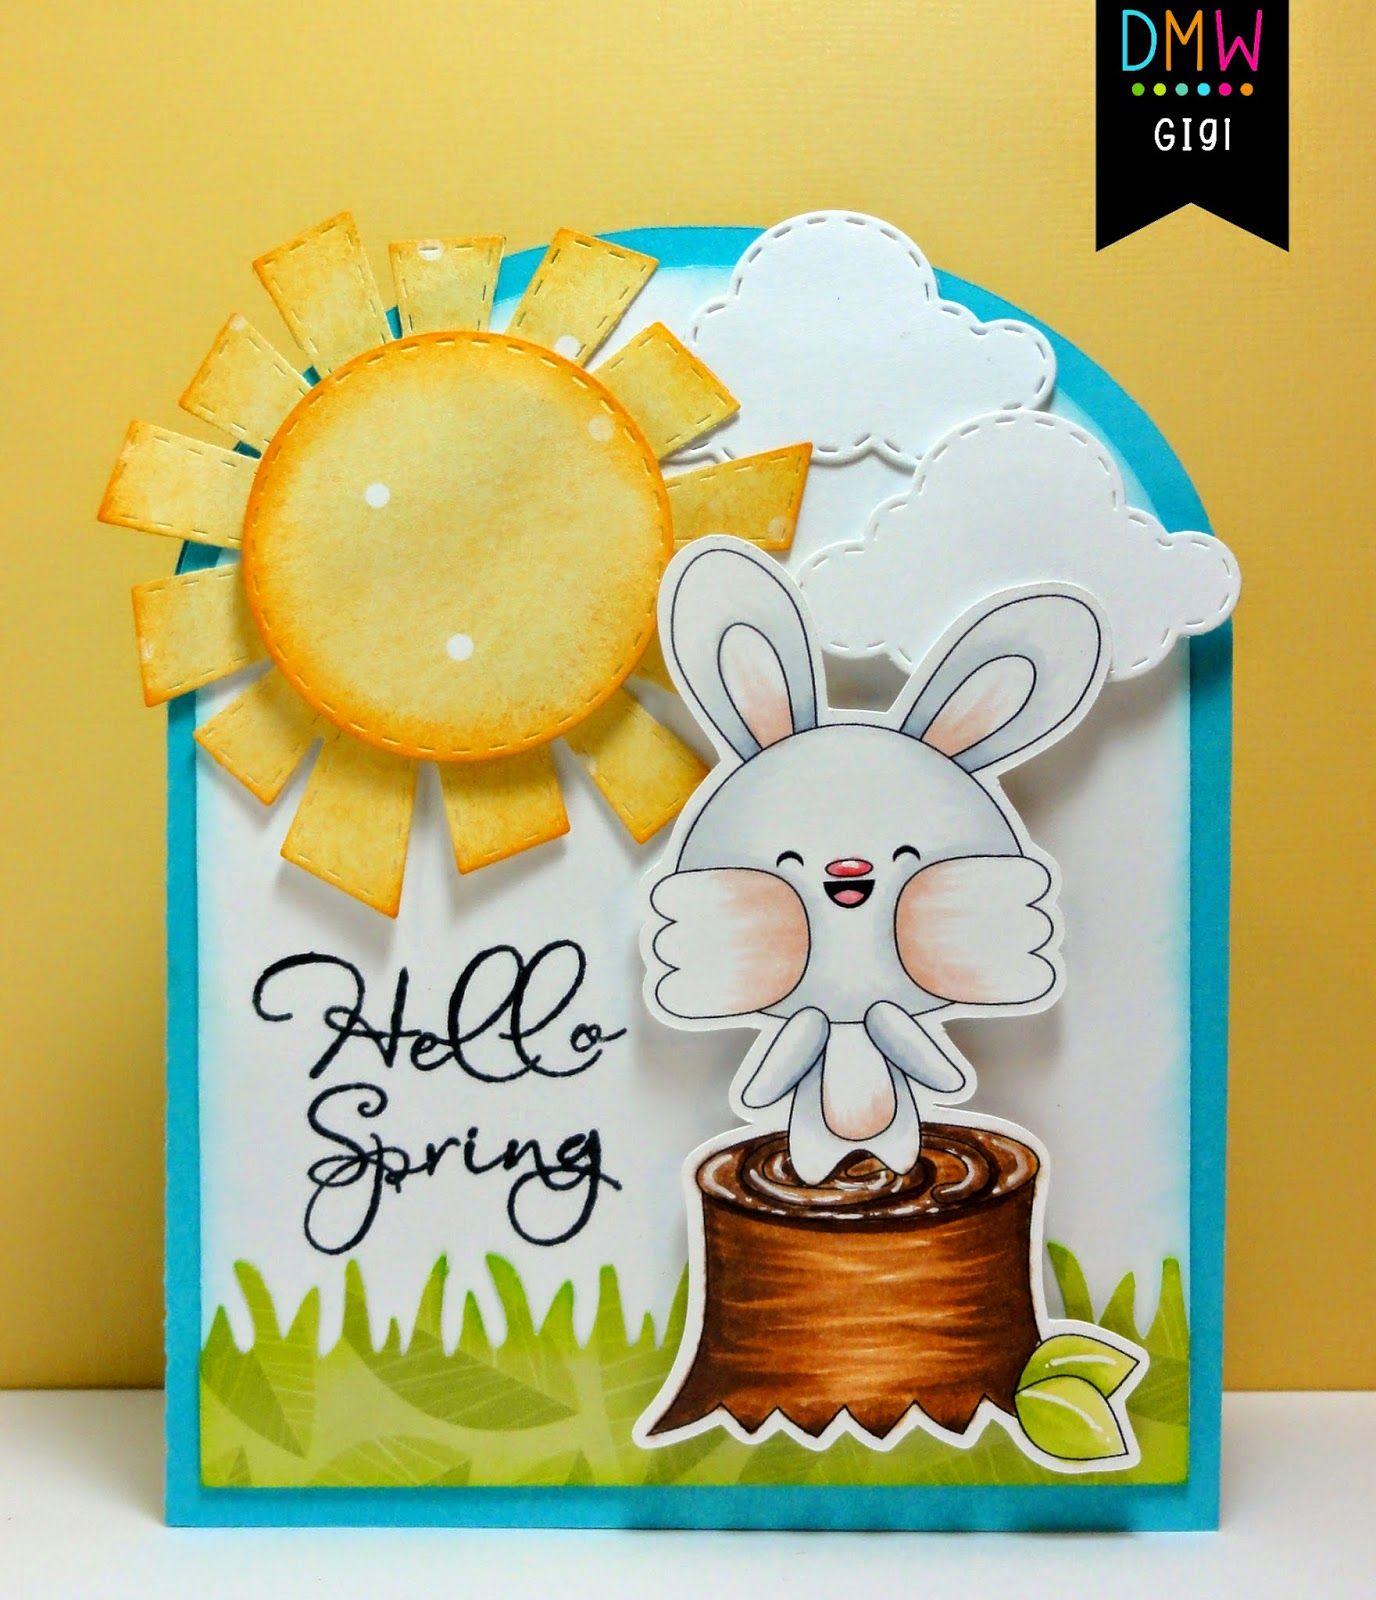 Hello Spring!-Using Spring Bunny